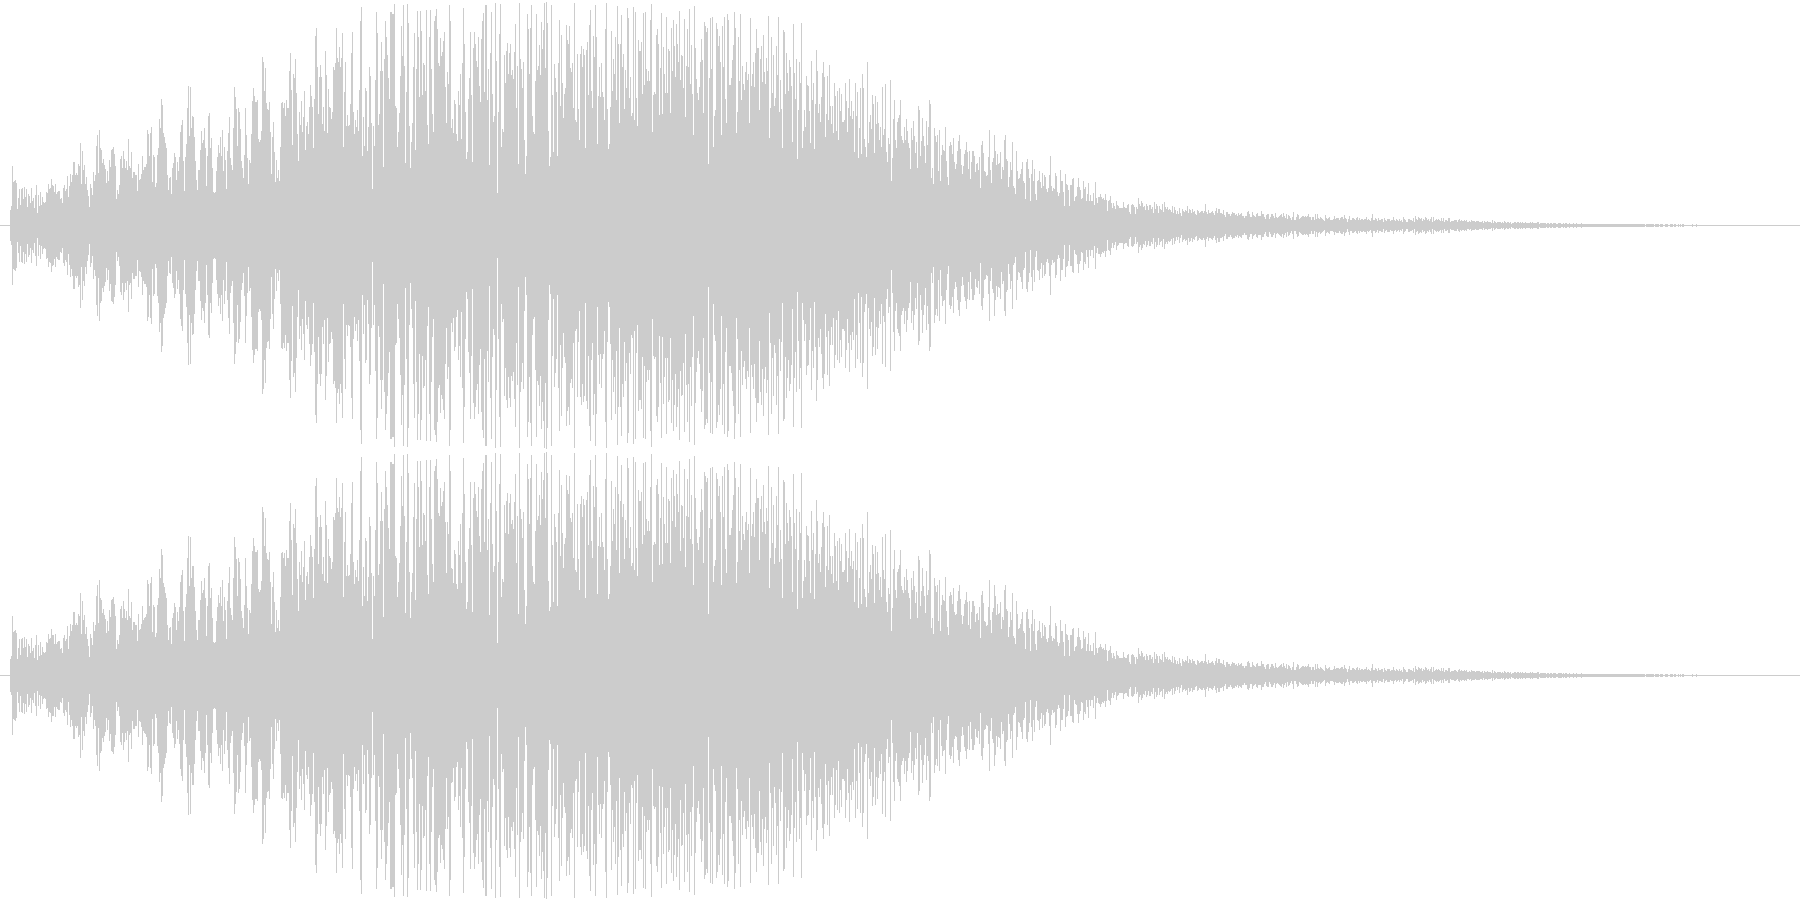 ティロロロロロロロロロロロロロンの未再生の波形